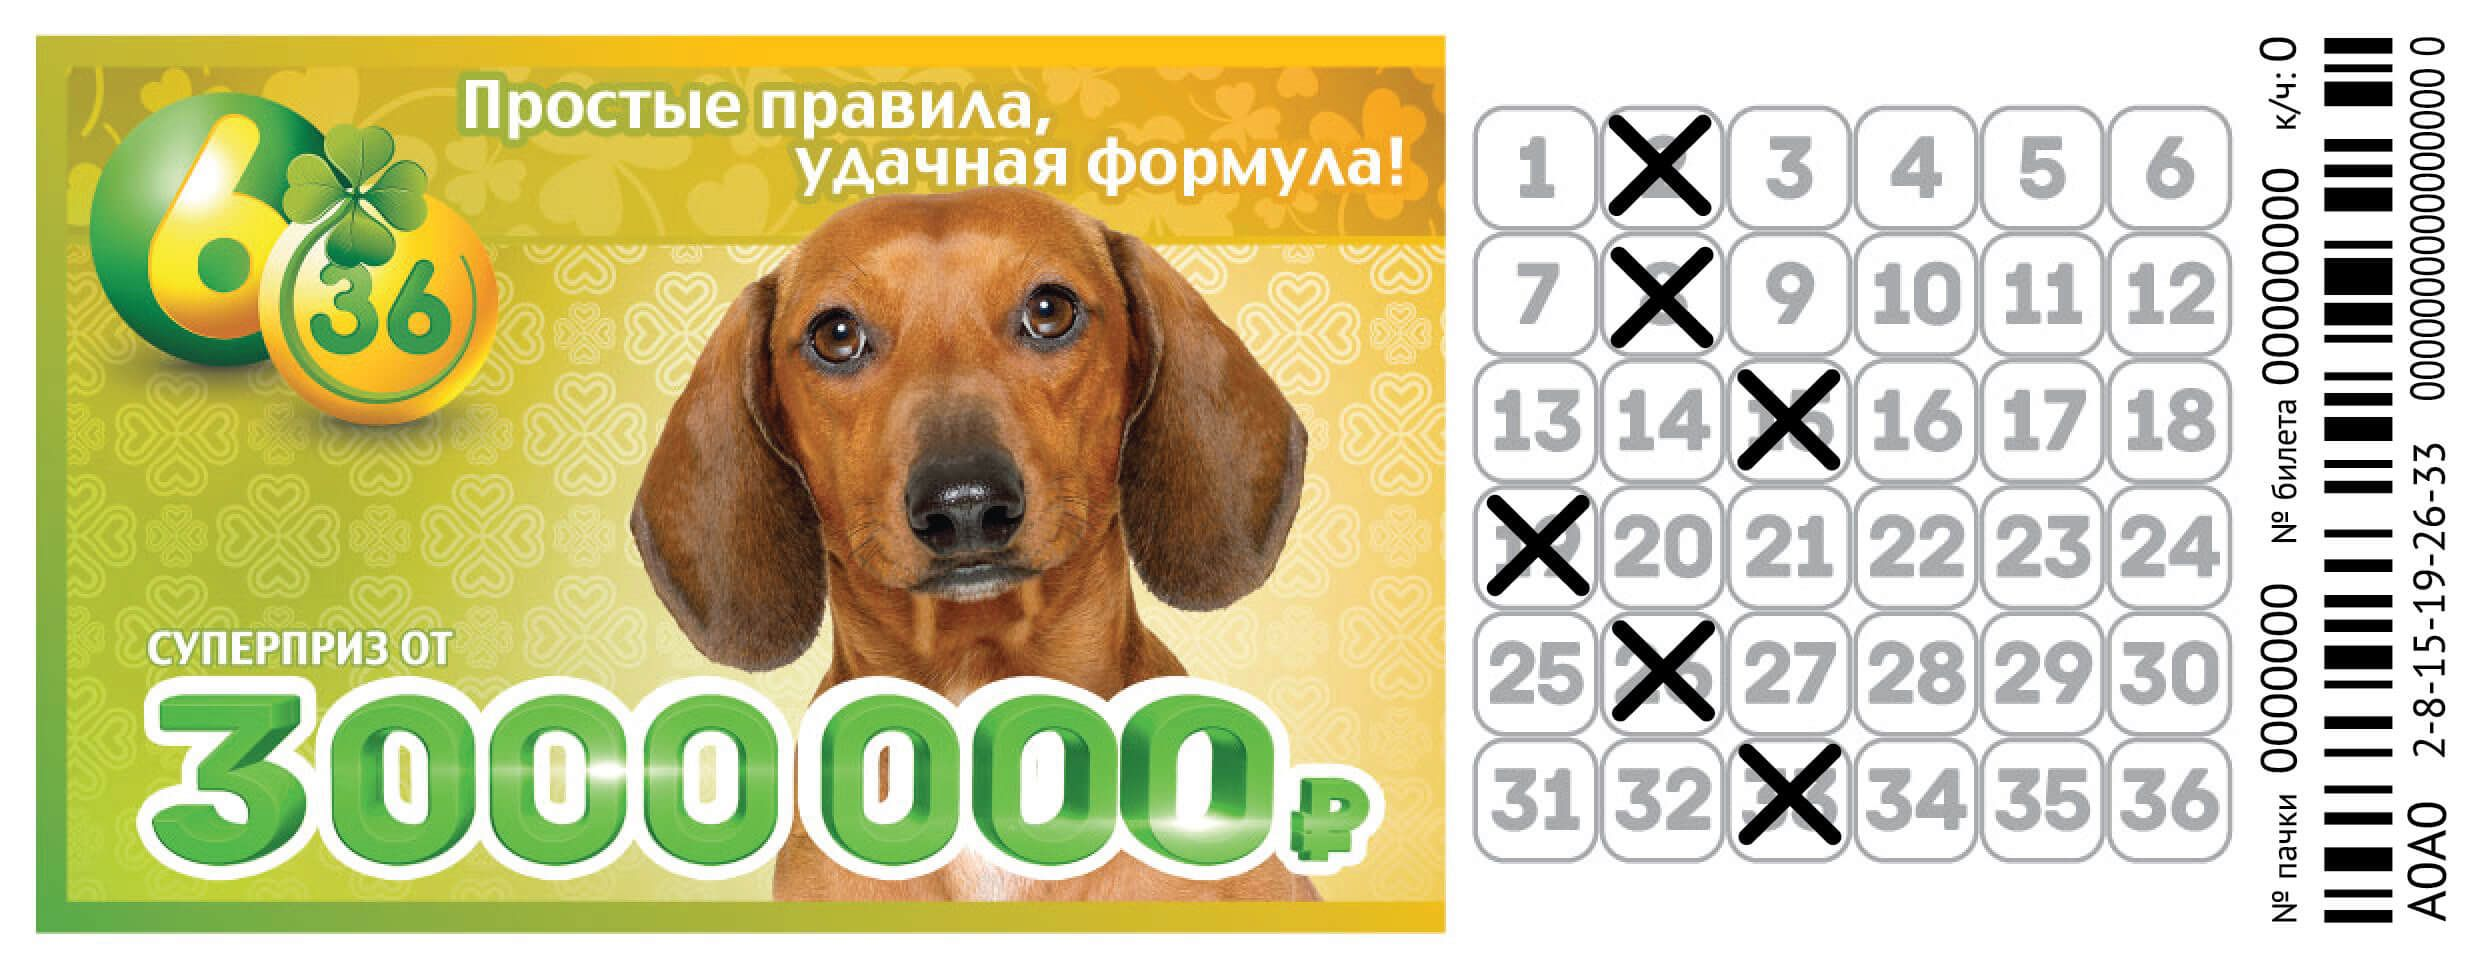 Купон лотереи 6 из 36